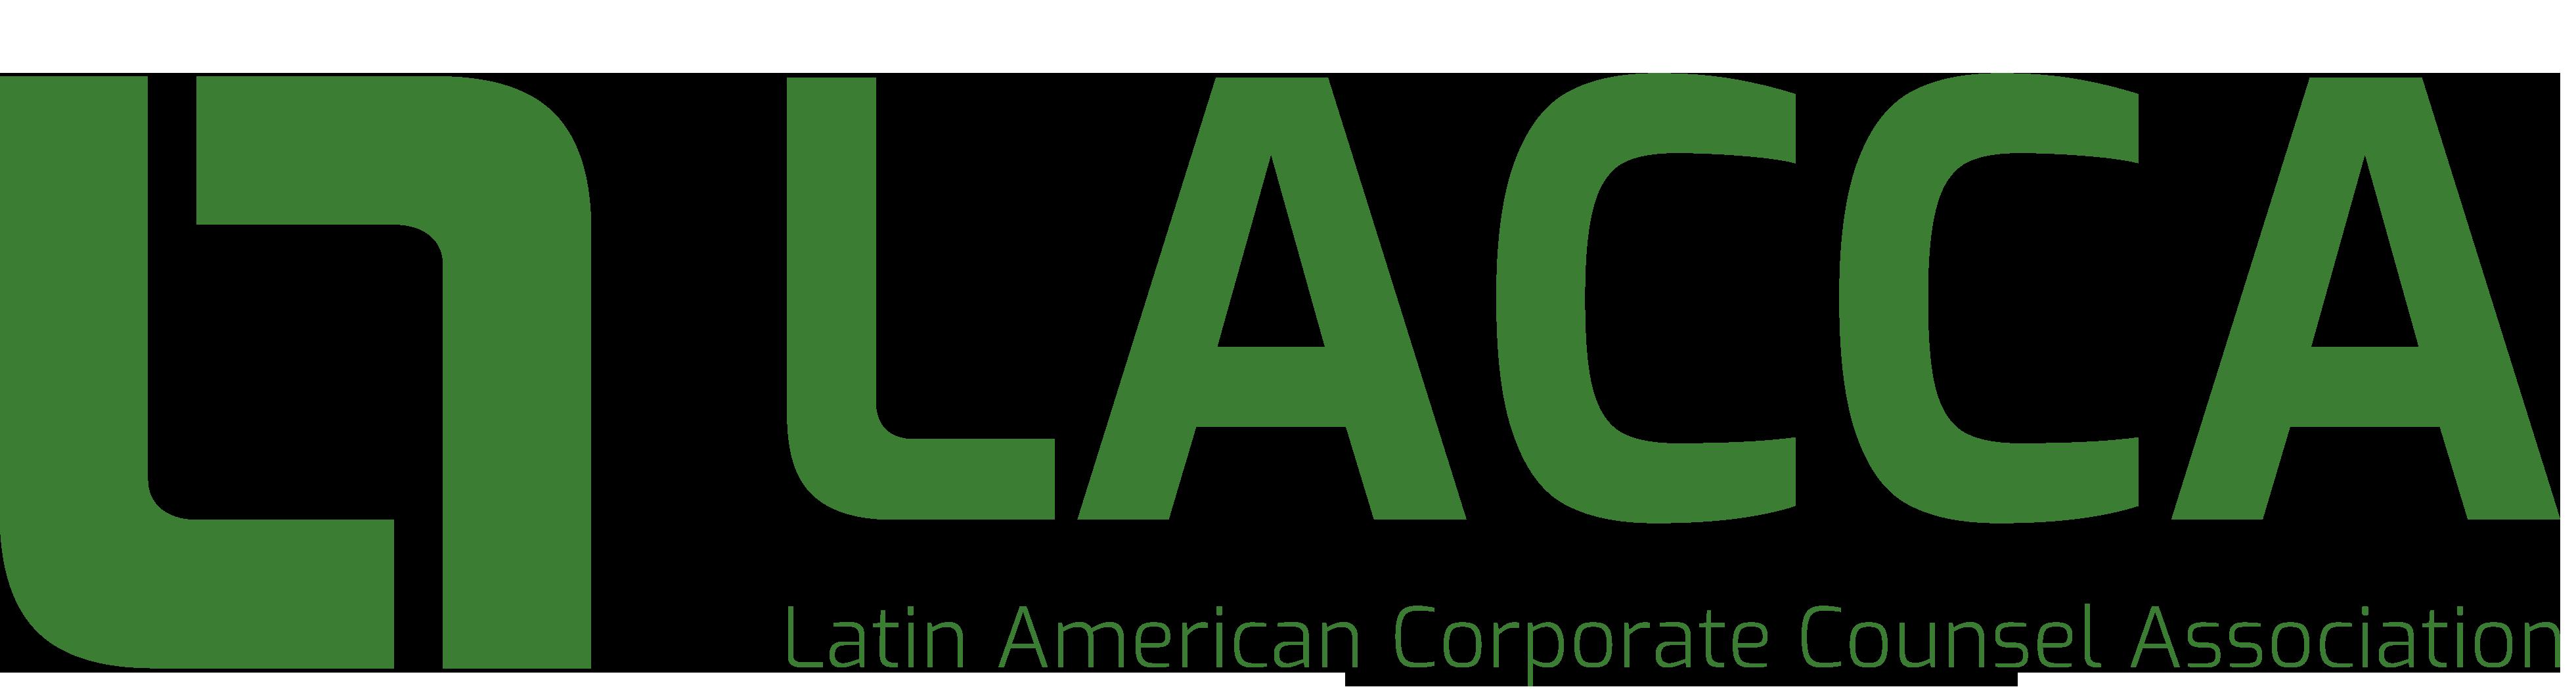 LACCA_logo_300dpi